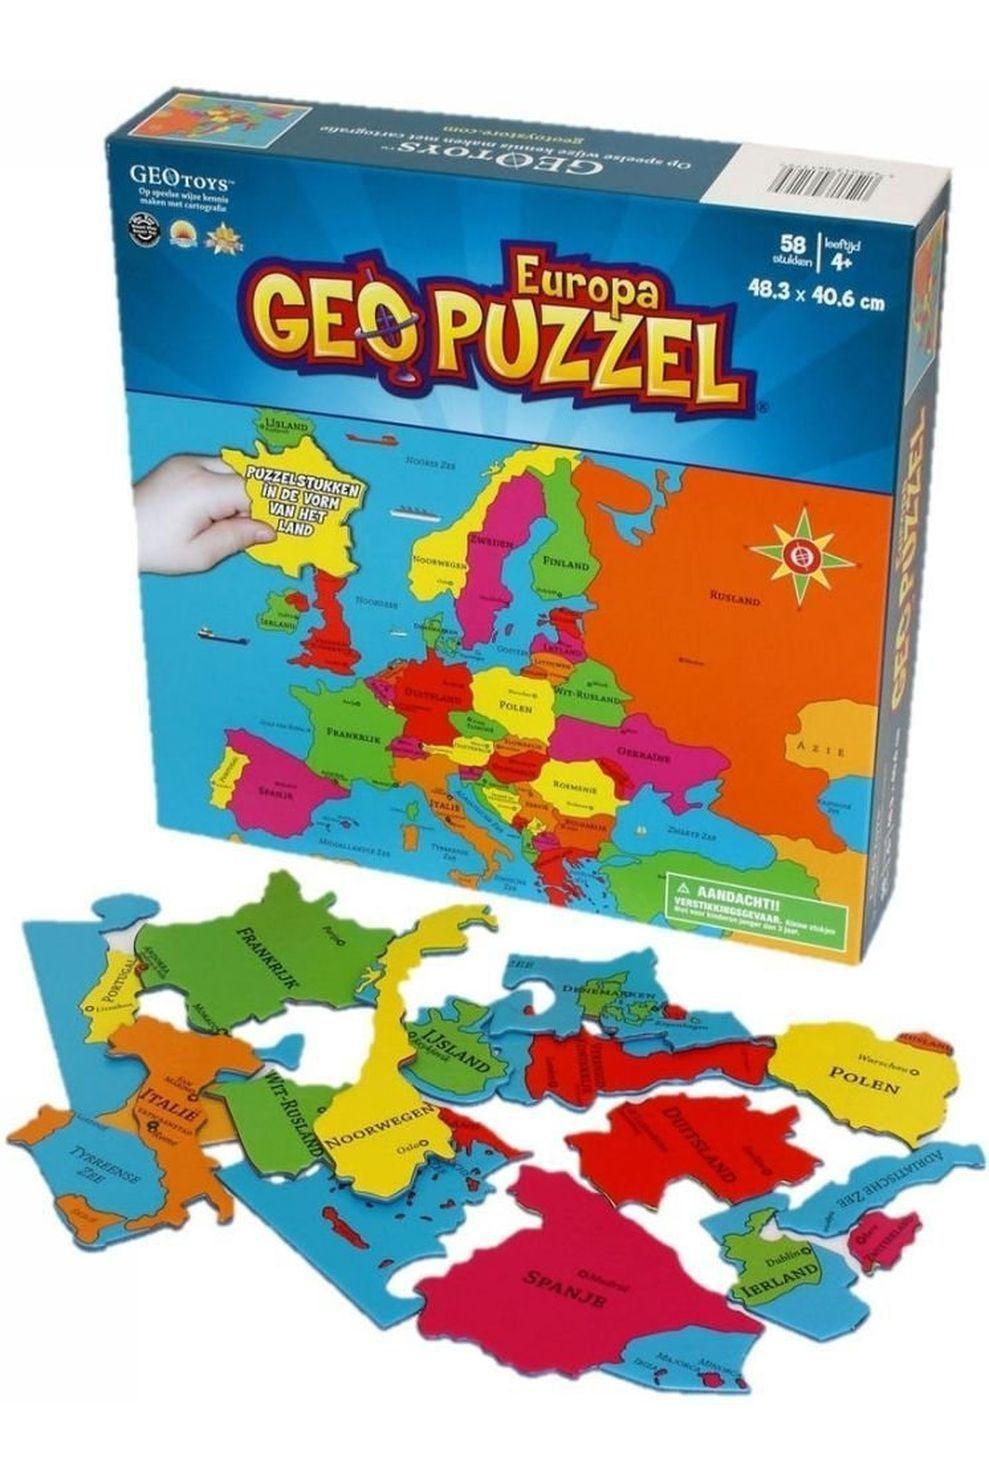 GEOTOYS Reisboek GeoPuzzle Europa 58 stukken (NL) 483 x 406 mm - 2020